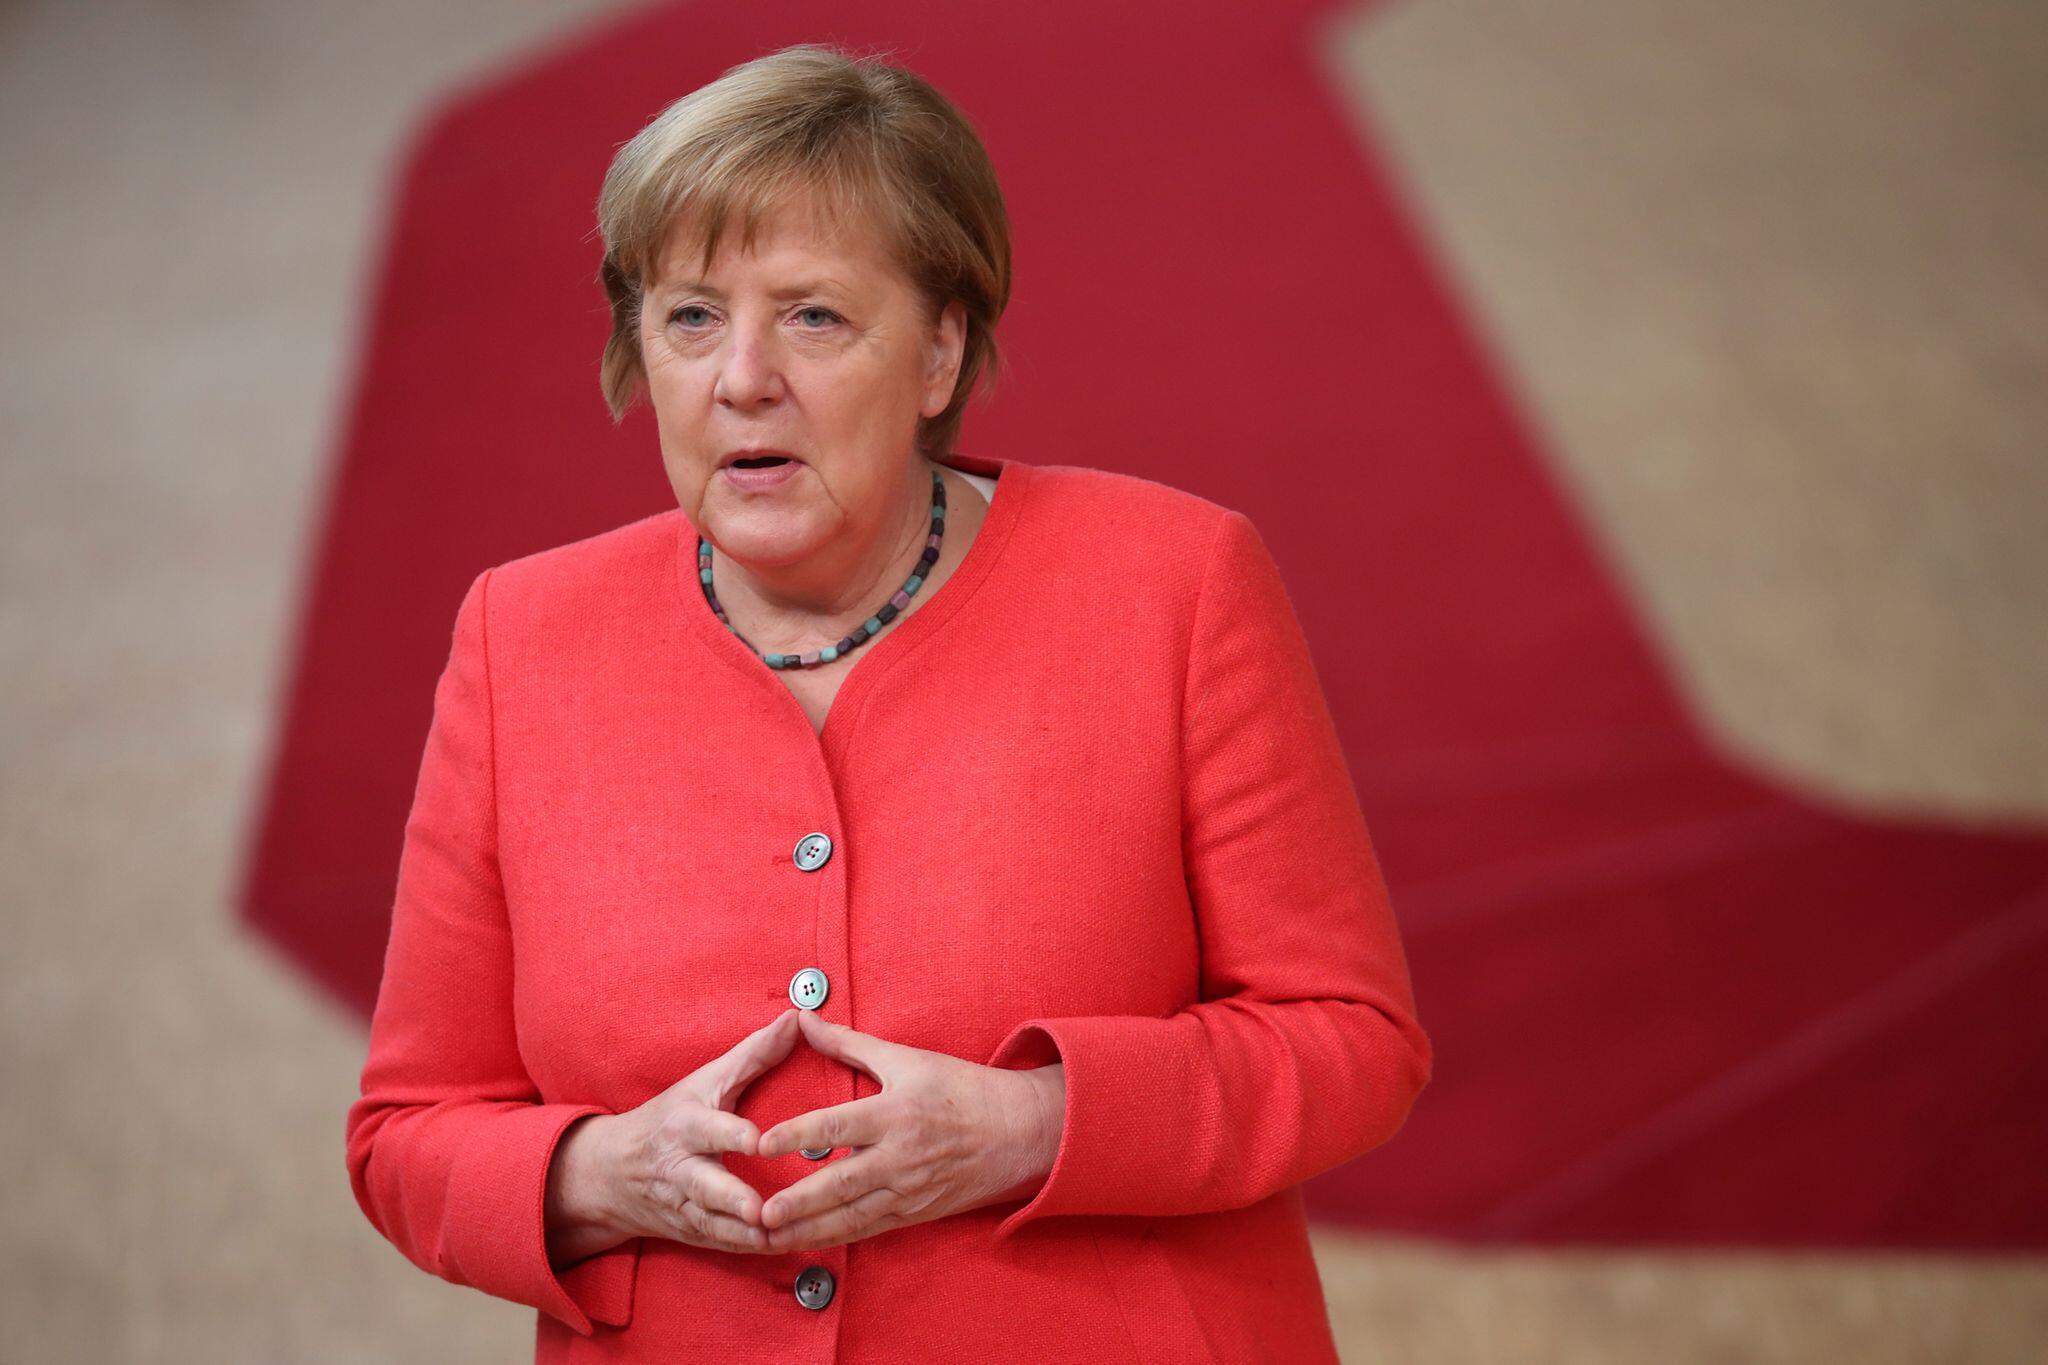 EU-Gipfel in Brüssel - Verhandlungen über Corona-Fonds unterbrochen